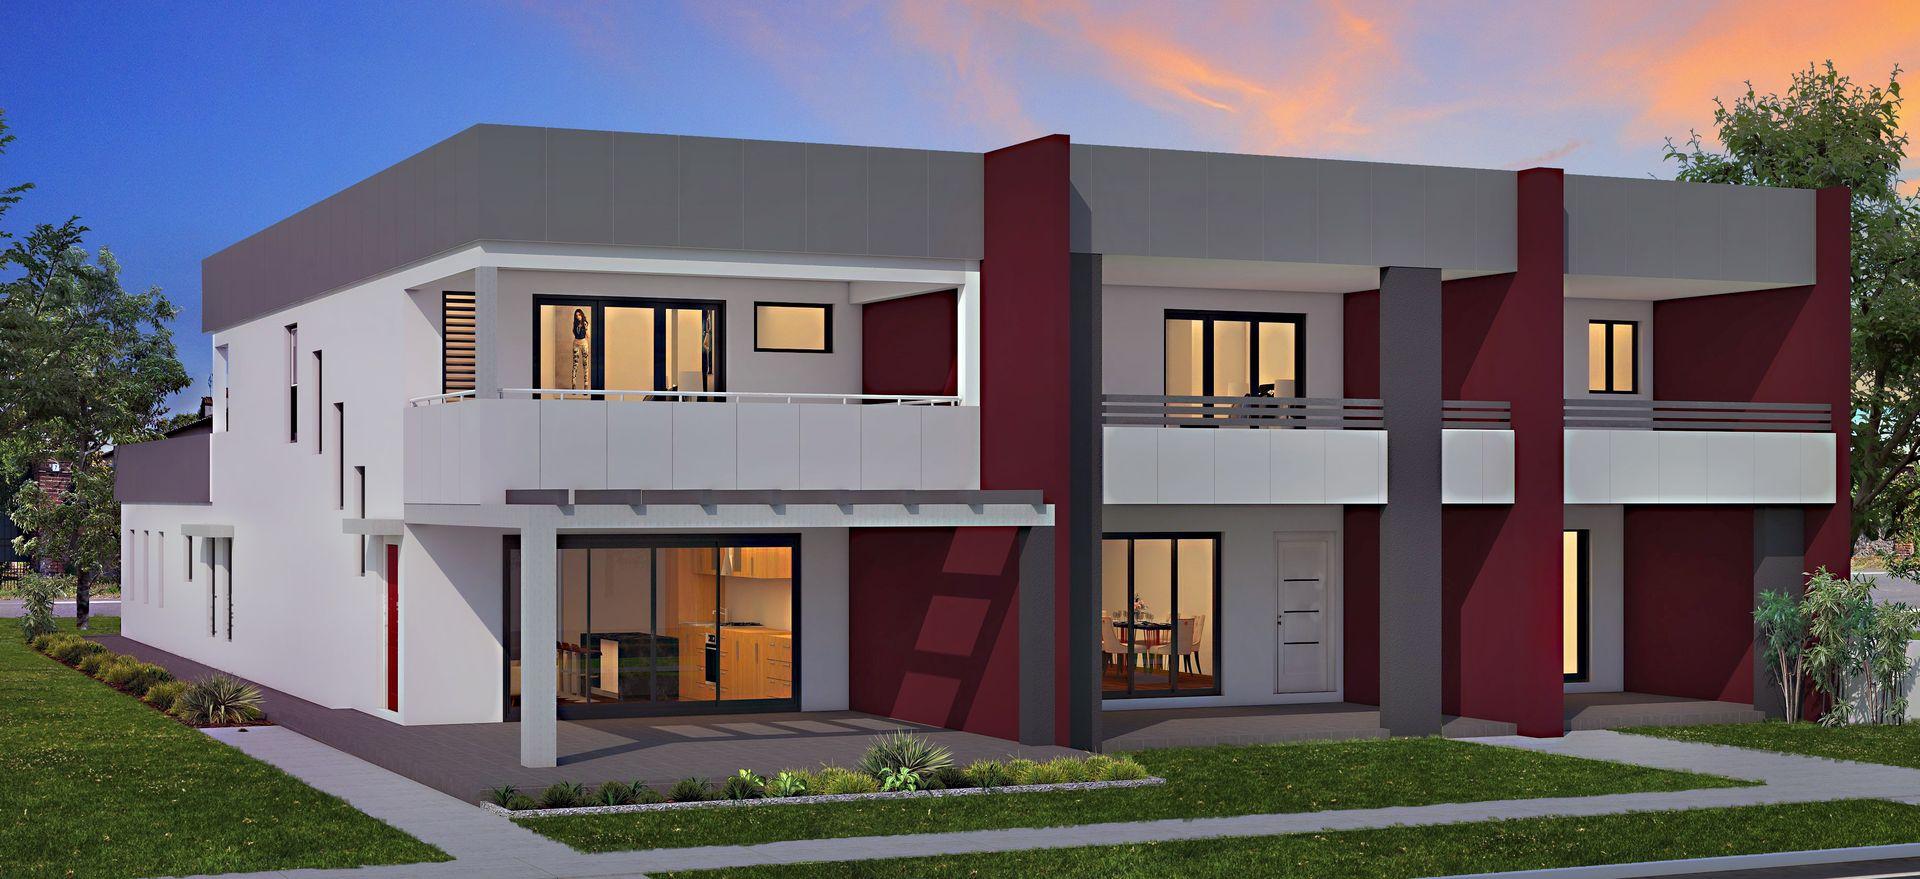 Lot 1121 Holyoak Avenue, The Village, Oonoonba QLD 4811, Image 1